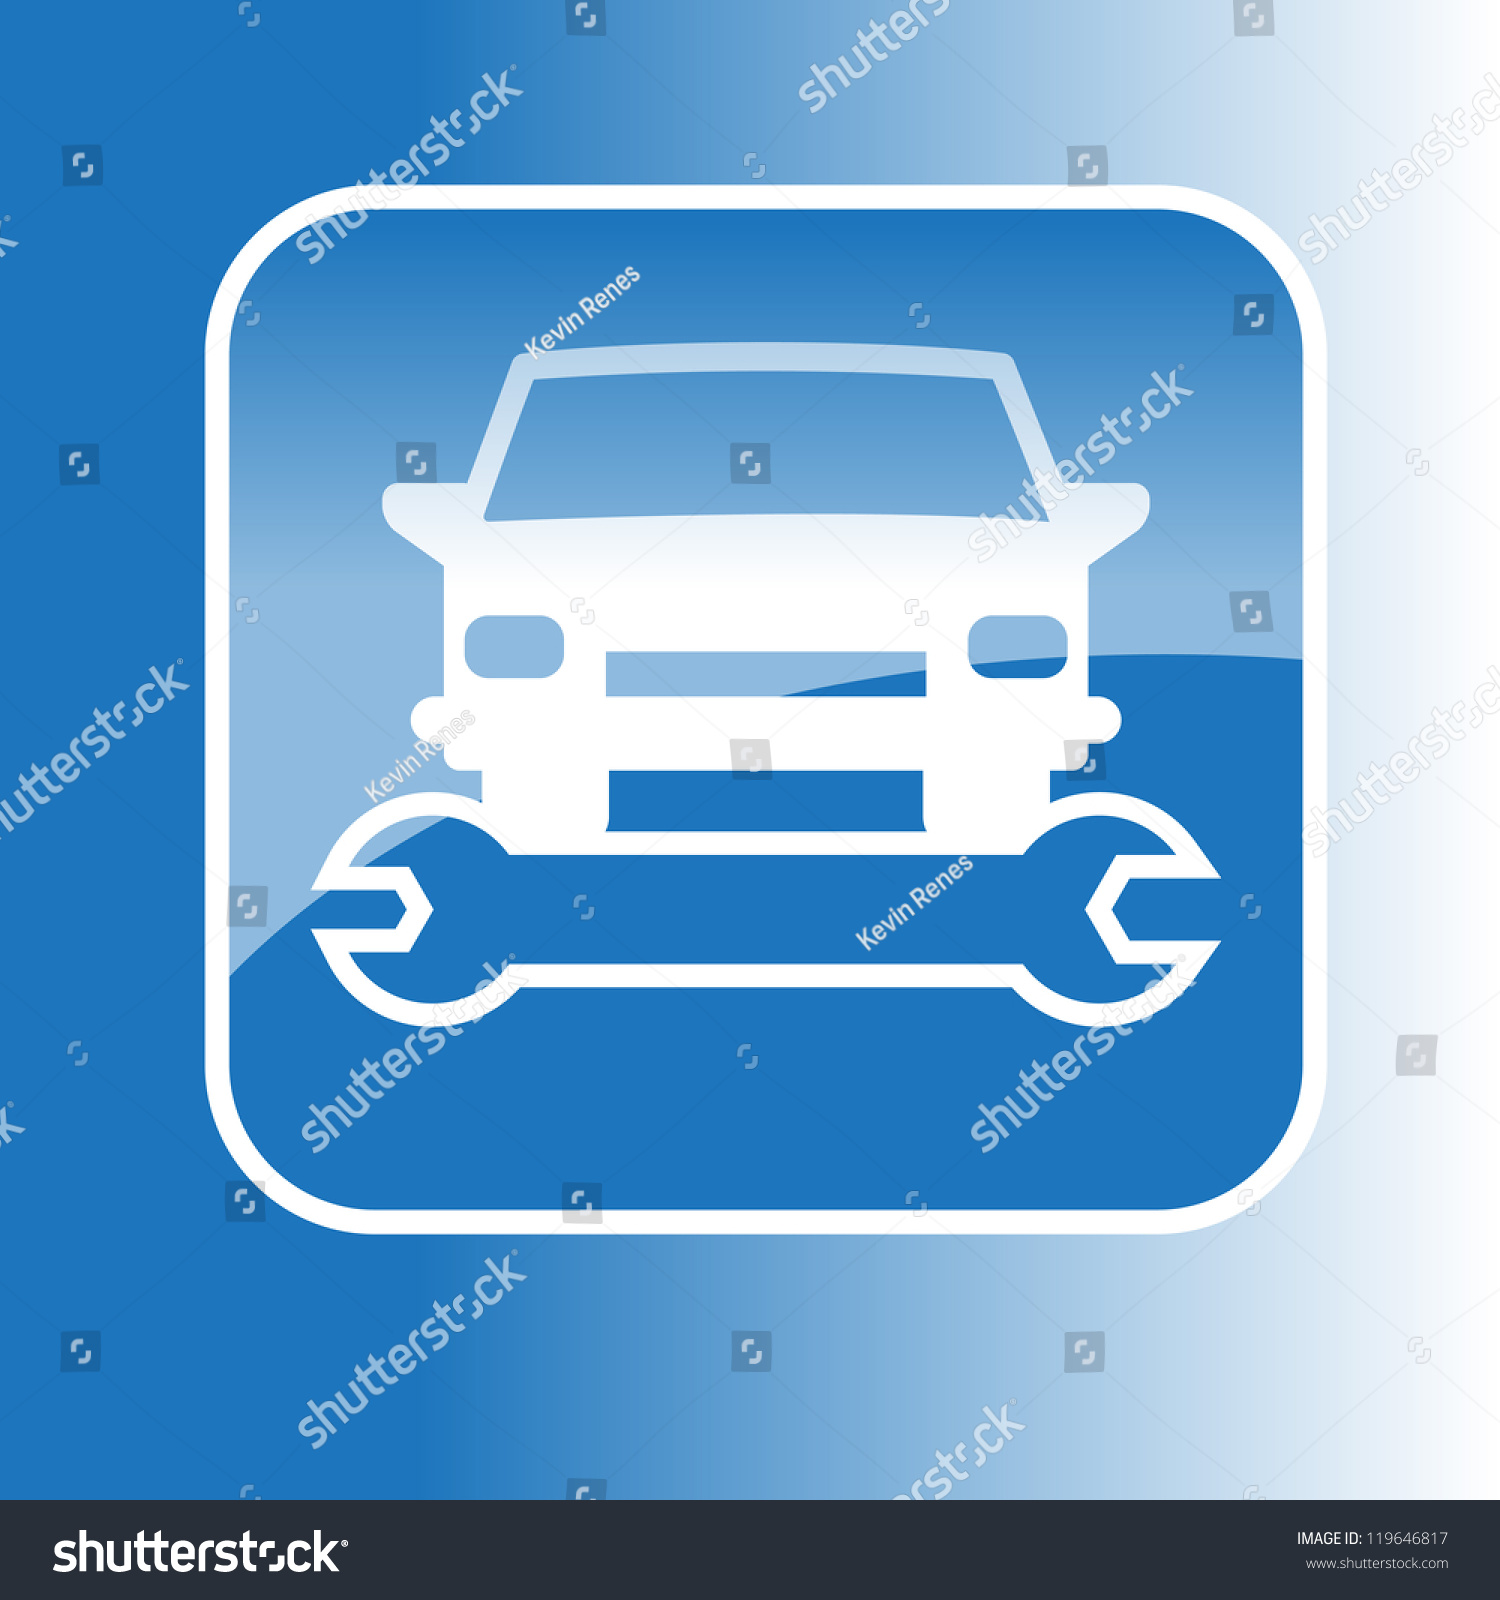 Vector symbol car wrench stock vector 119646817 shutterstock vector symbol of a car and a wrench biocorpaavc Choice Image